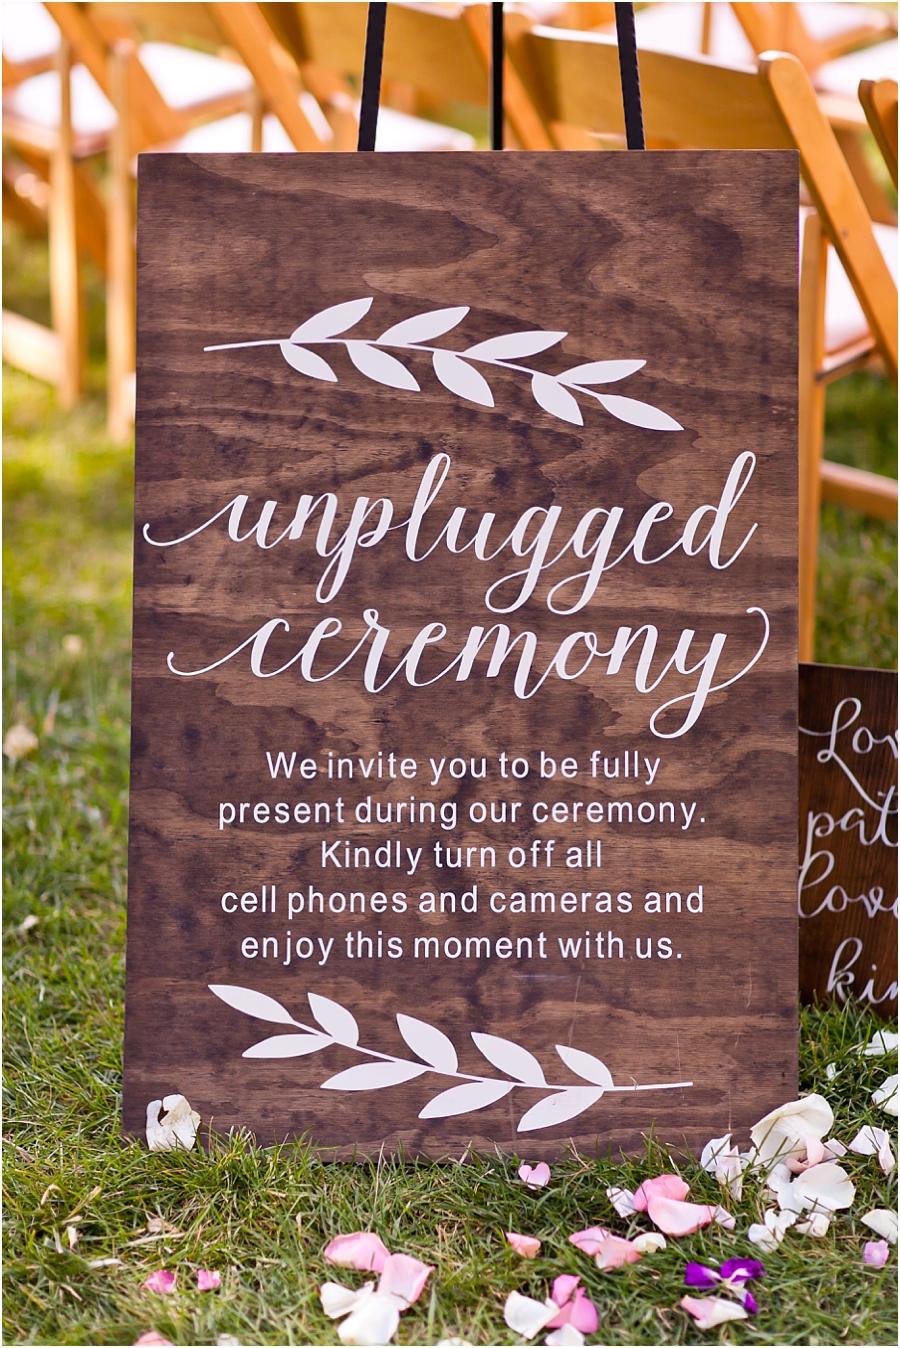 durango-colorado-unplugged-wedding.jpg